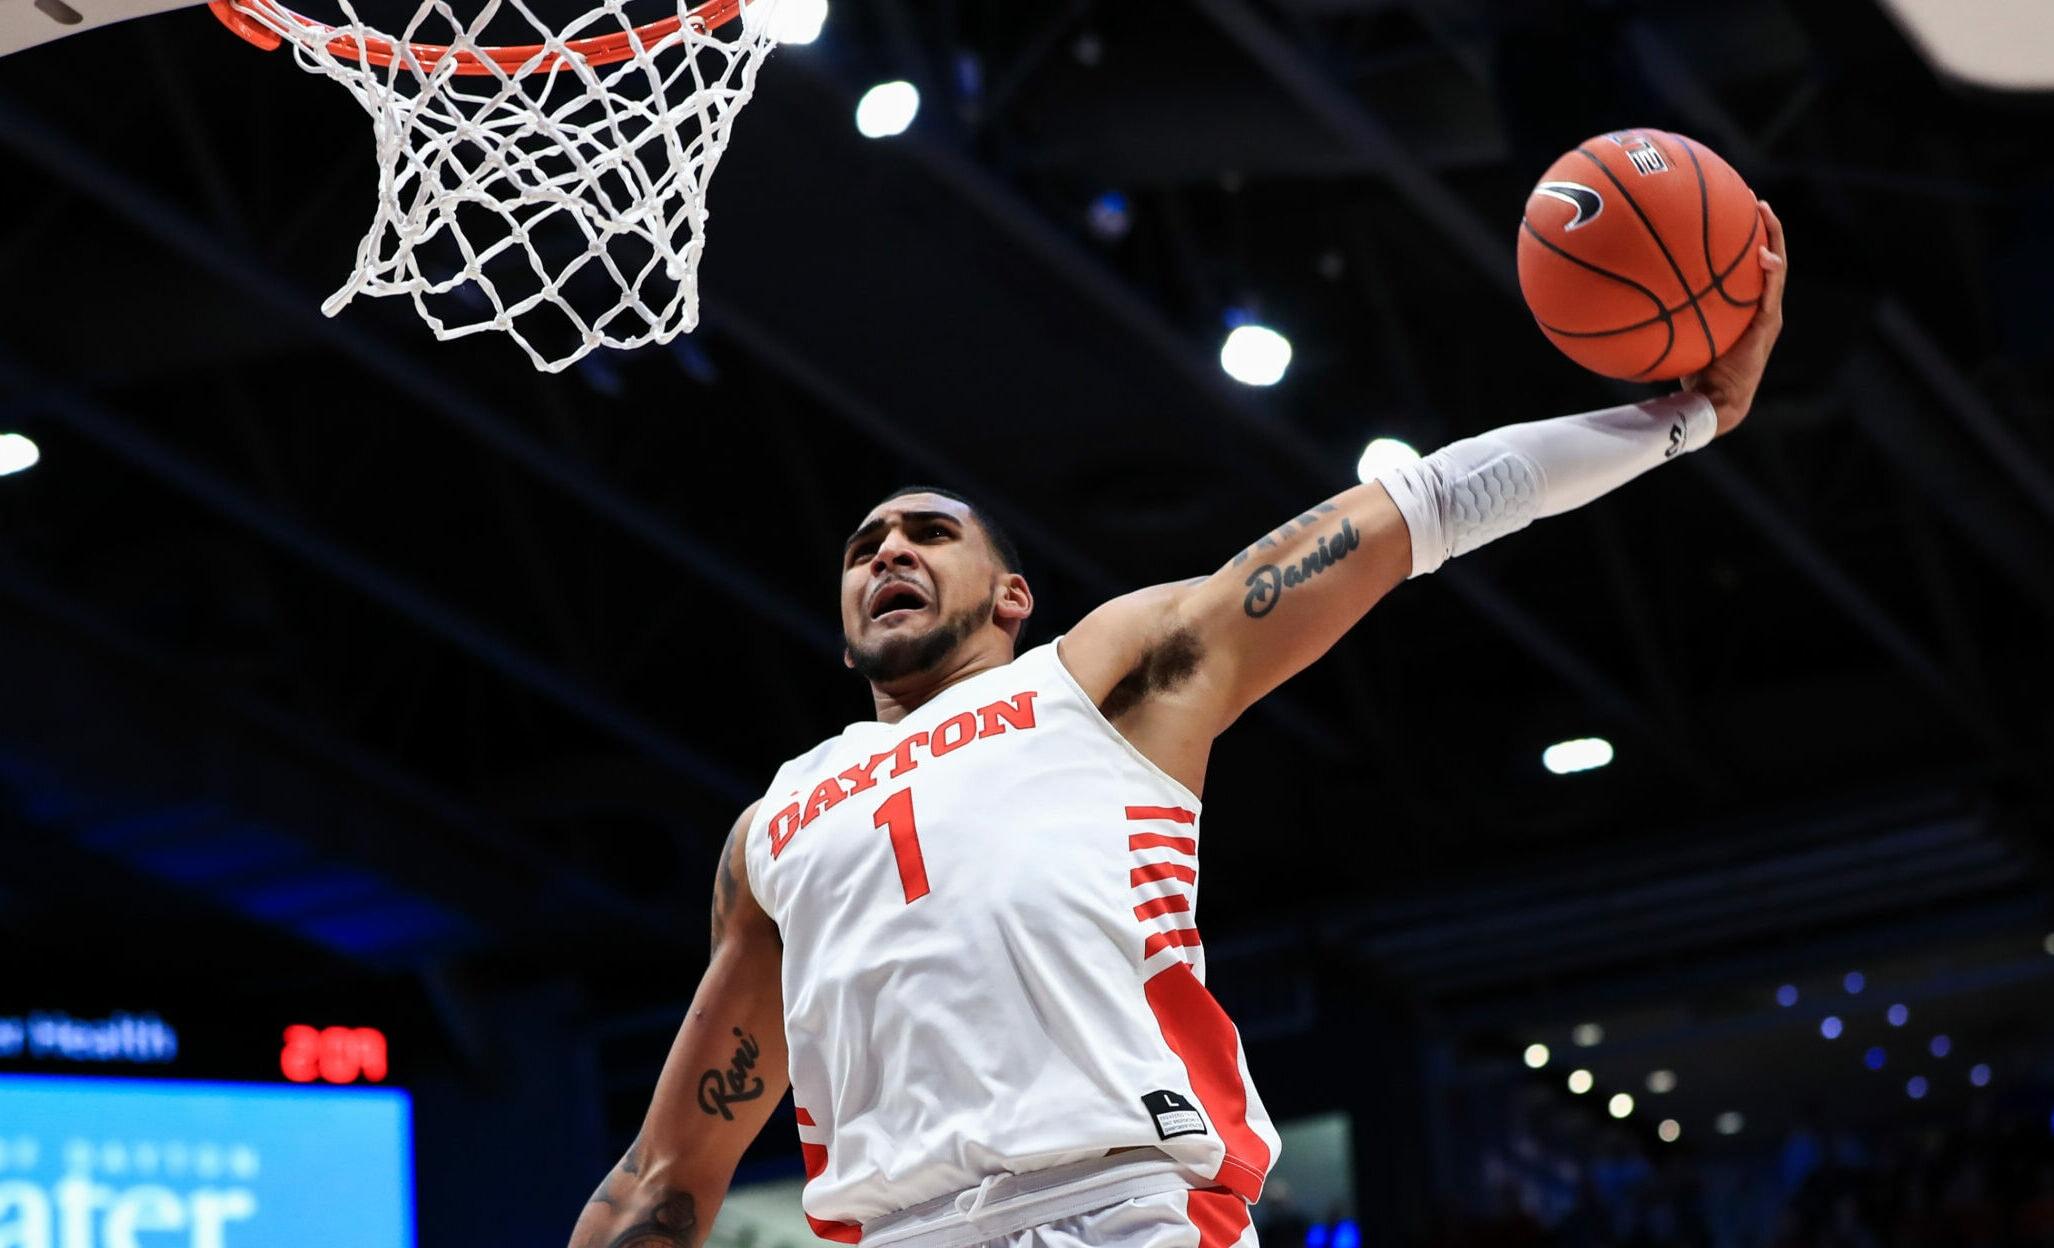 2020 NBA Draft: Top forward prospects